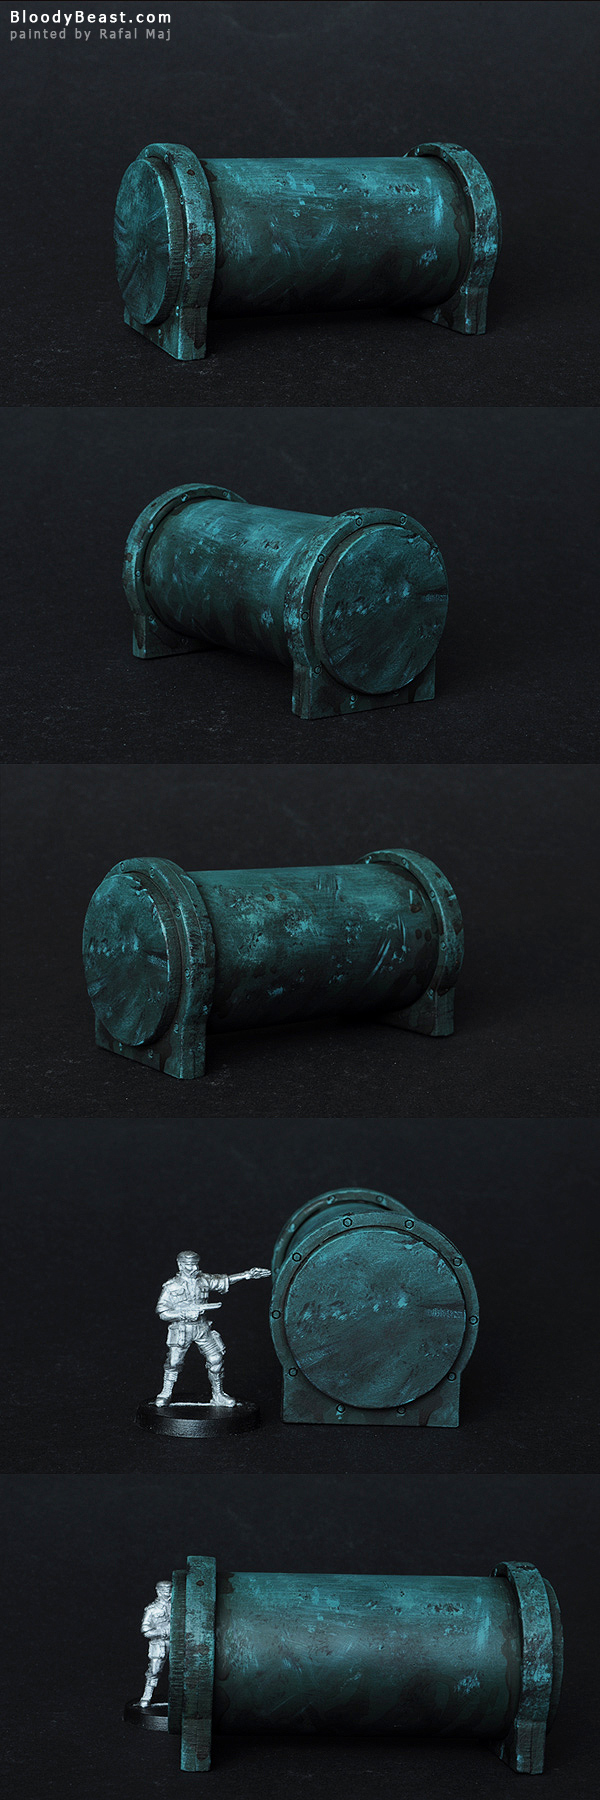 Water Tank painted by Rafal Maj (BloodyBeast.com)